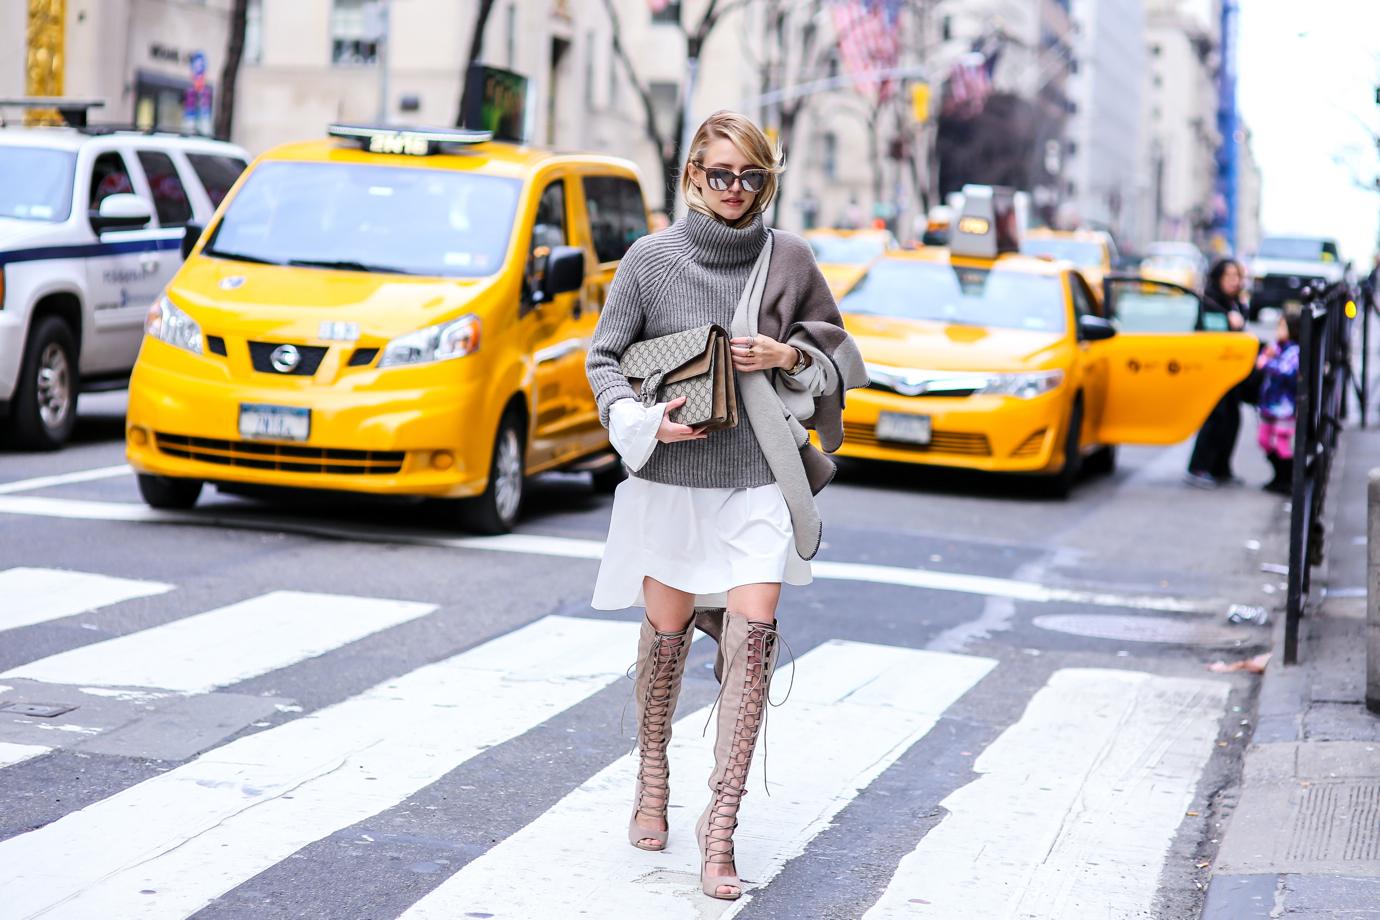 Bezaubernde Nana, bezauberndenana.de, Fashionblog, Lifestyleblog, Nana's Monthly Review, Februar 2016, Outfit des Monats, Ohh Couture